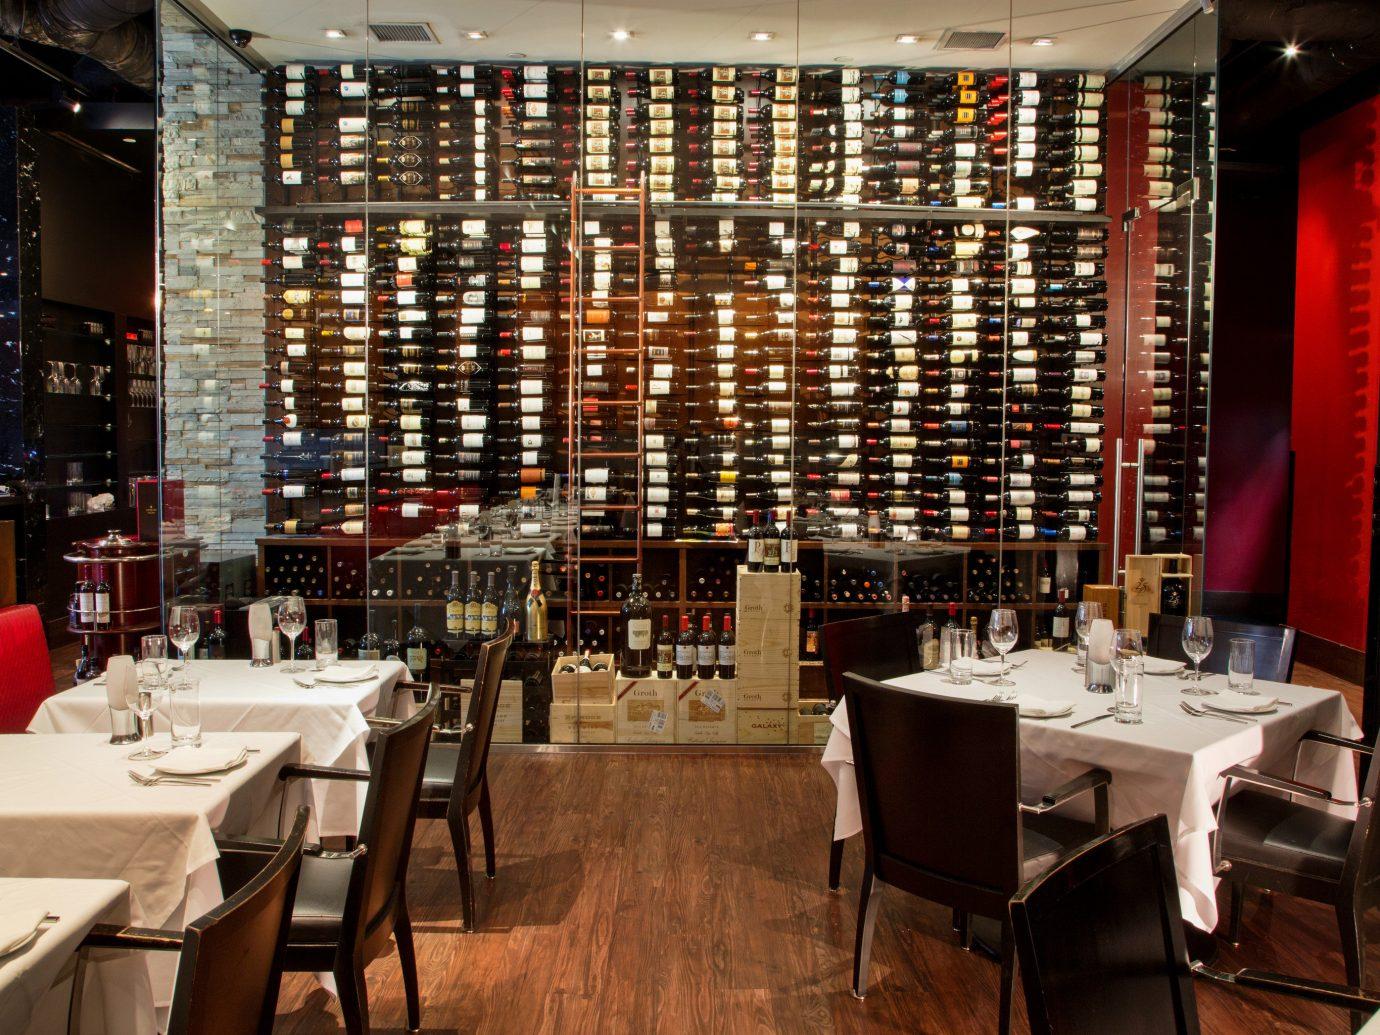 Travel Tips indoor floor table restaurant window interior design ceiling café room